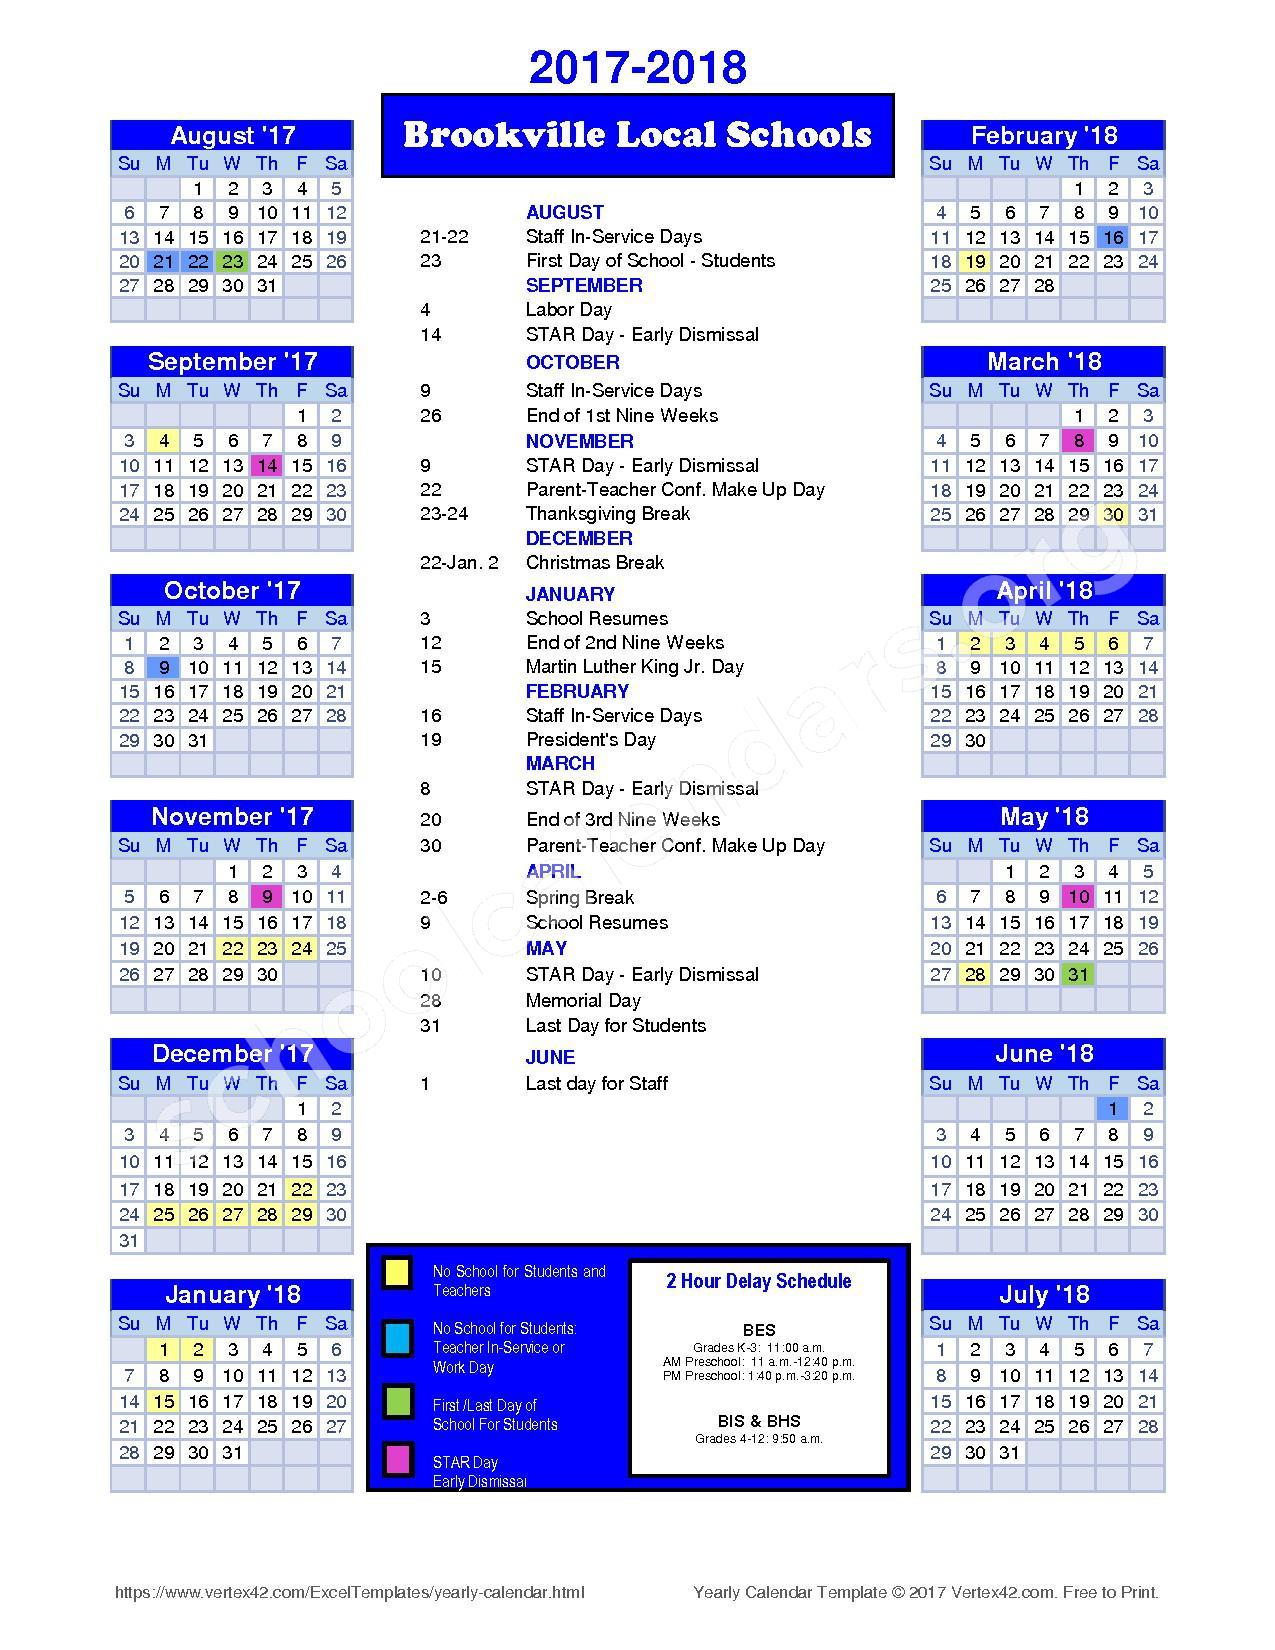 2017 - 2018 District Calendar – Brookville Local Schools – page 1